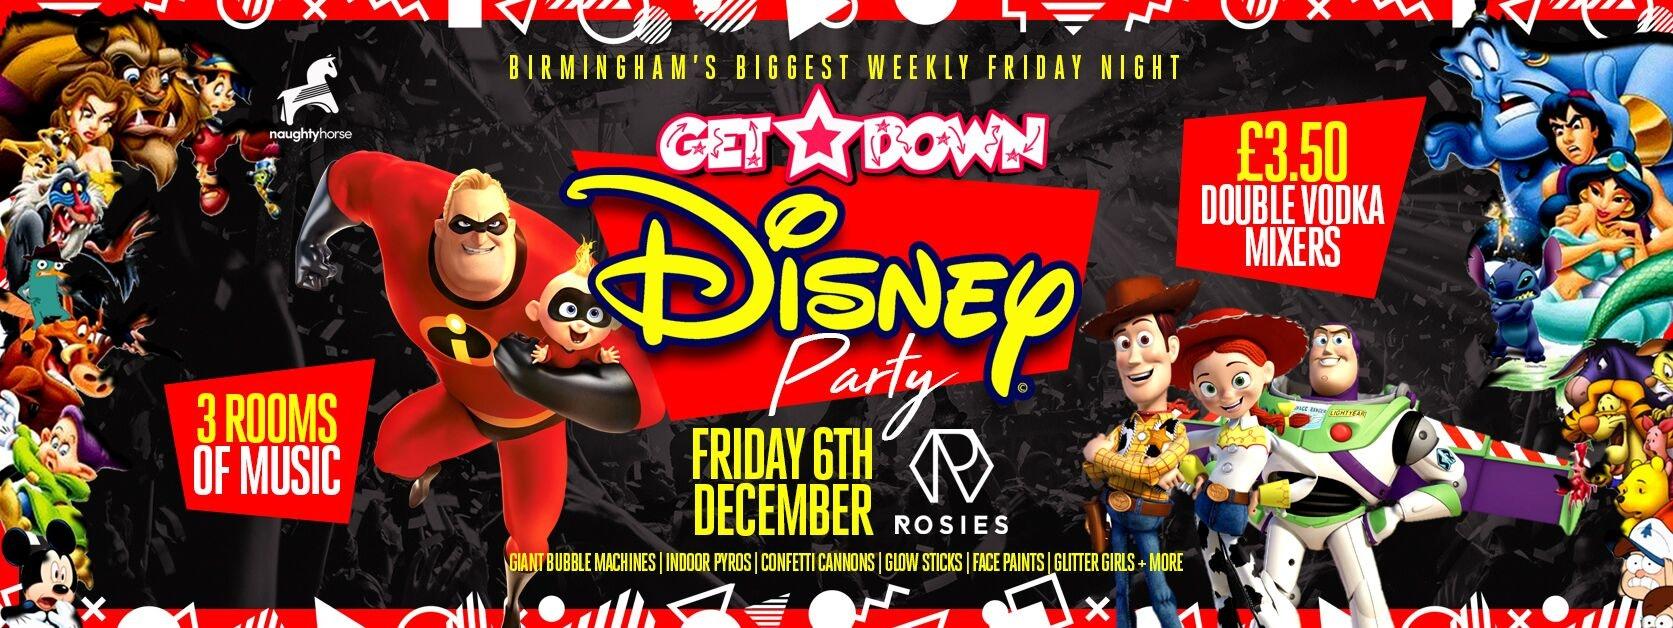 Get Down Fridays Presents – DISNEY PARTY